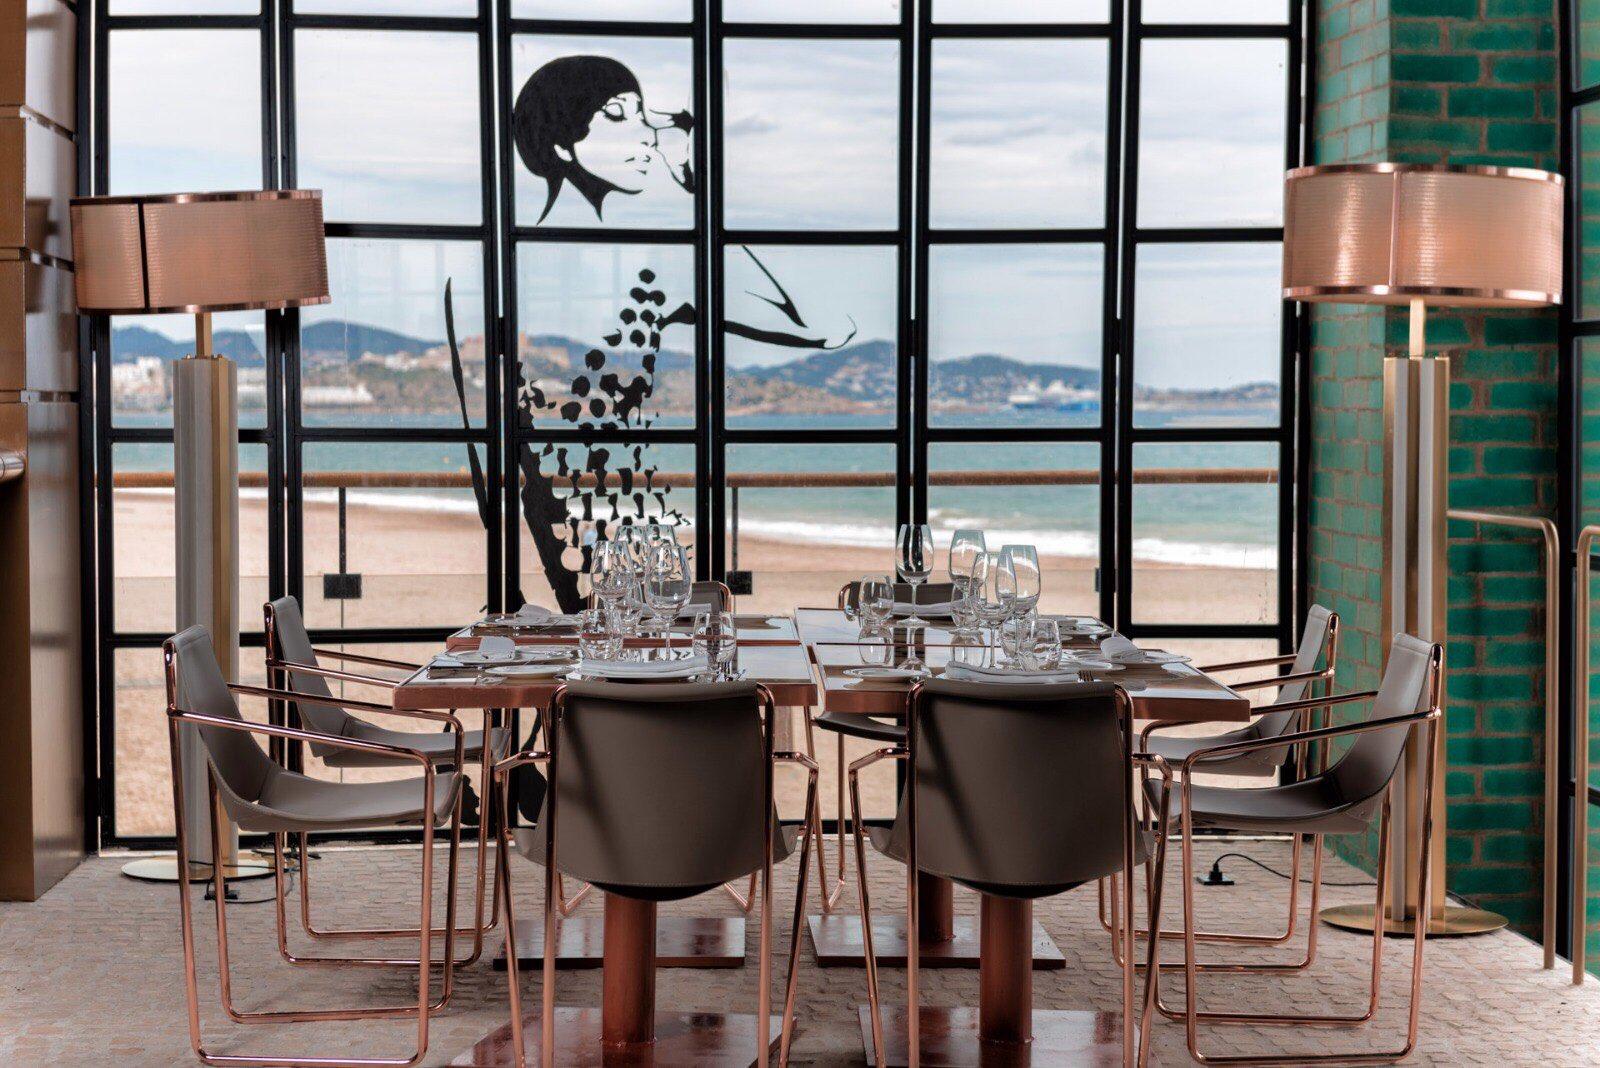 Ya hemos abierto #TATELIbiza! @TatelRestaurant @PauGasol @RafaelNadal #TATELMadrid #TATELMiami https://t.co/XmzUFfCiwm